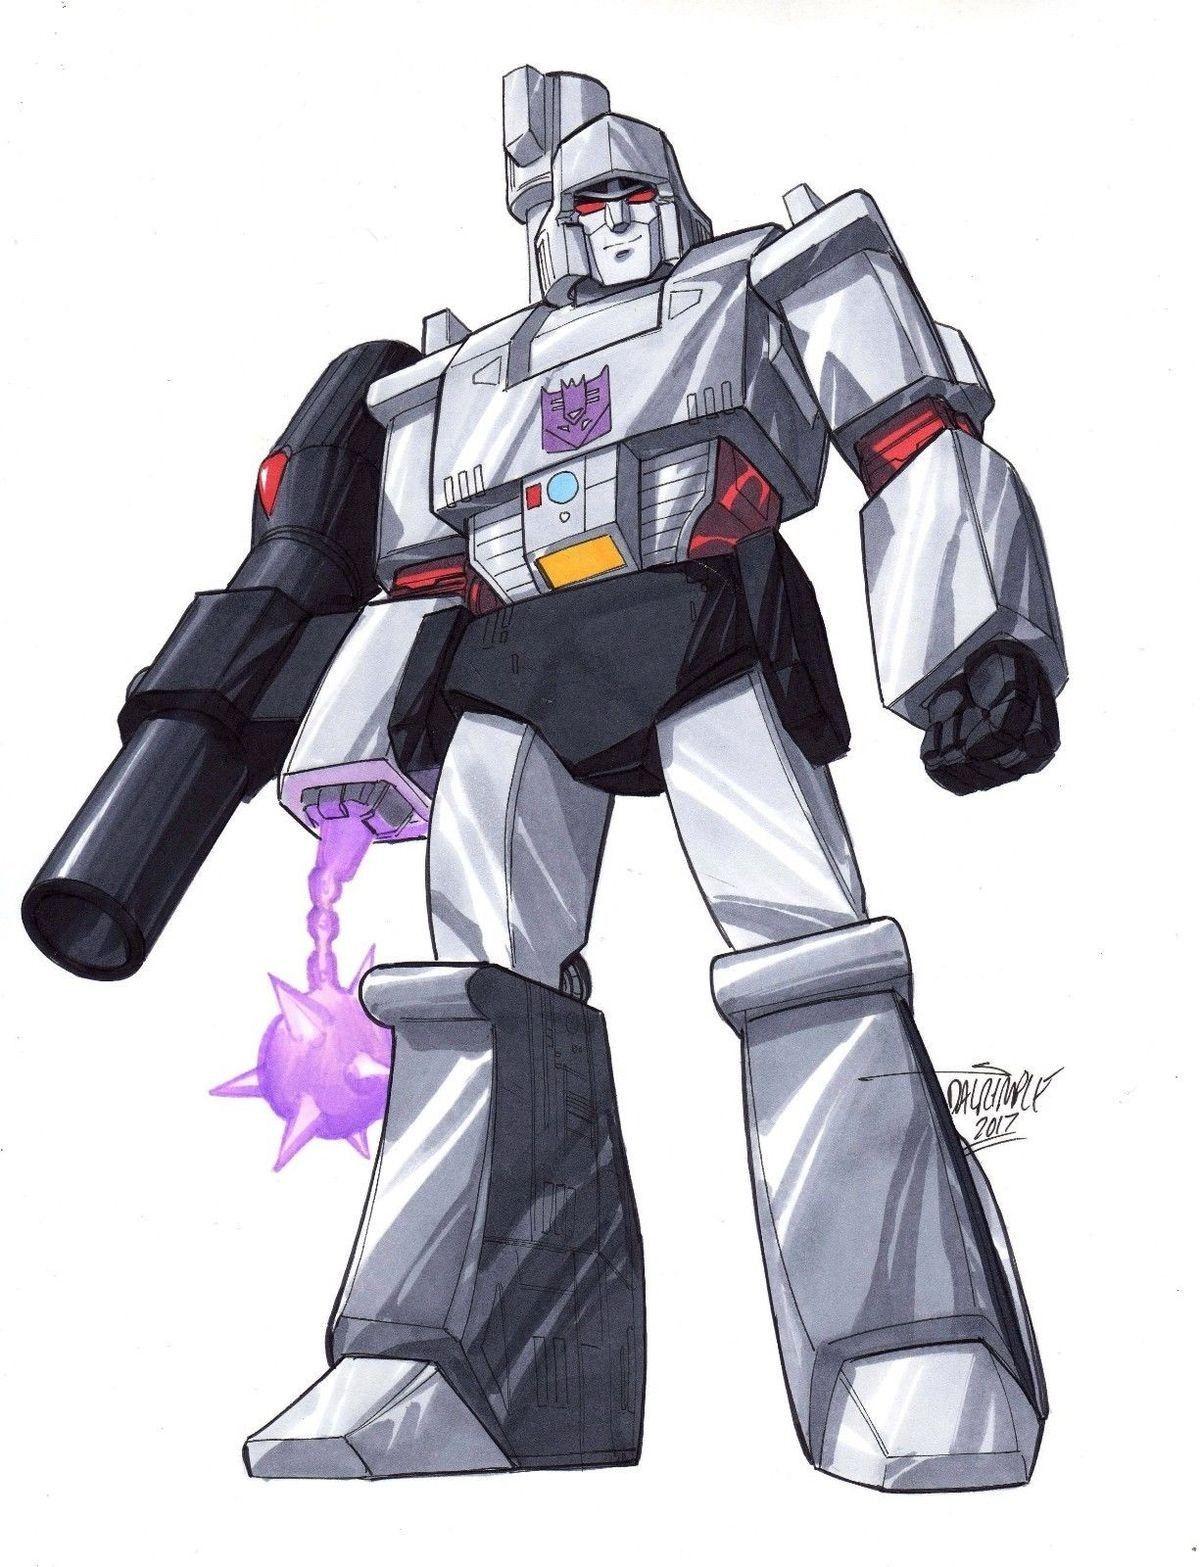 Vintage G1 Transformers Megatron Top Stock Piece